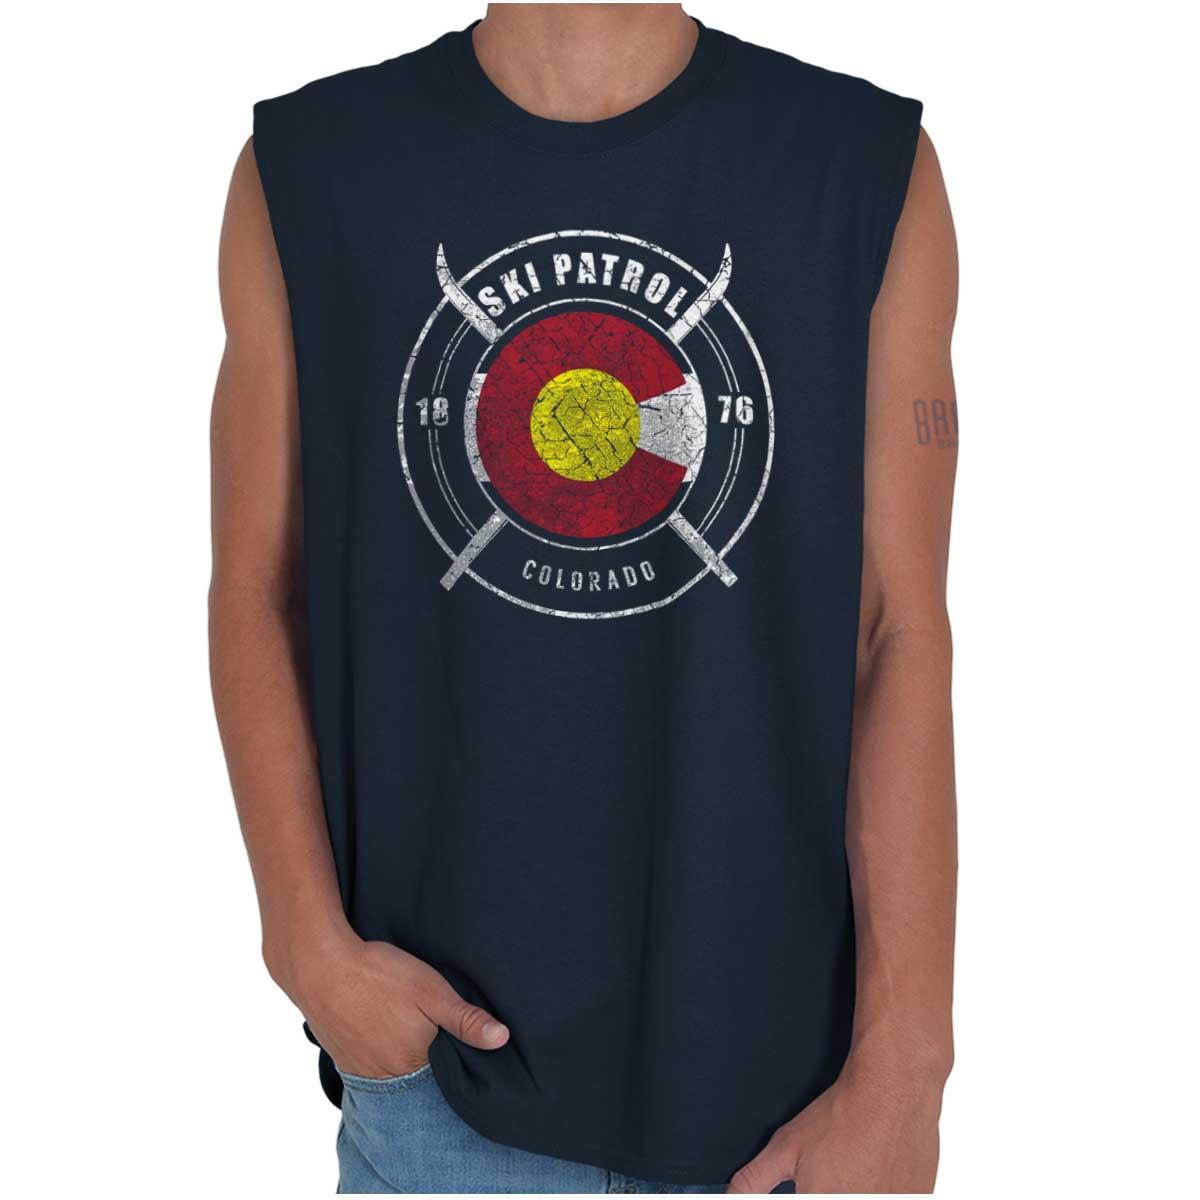 Colorado CO Ski Patrol V-neck Tee Top Skiing Sports America USA T Shirt V neck